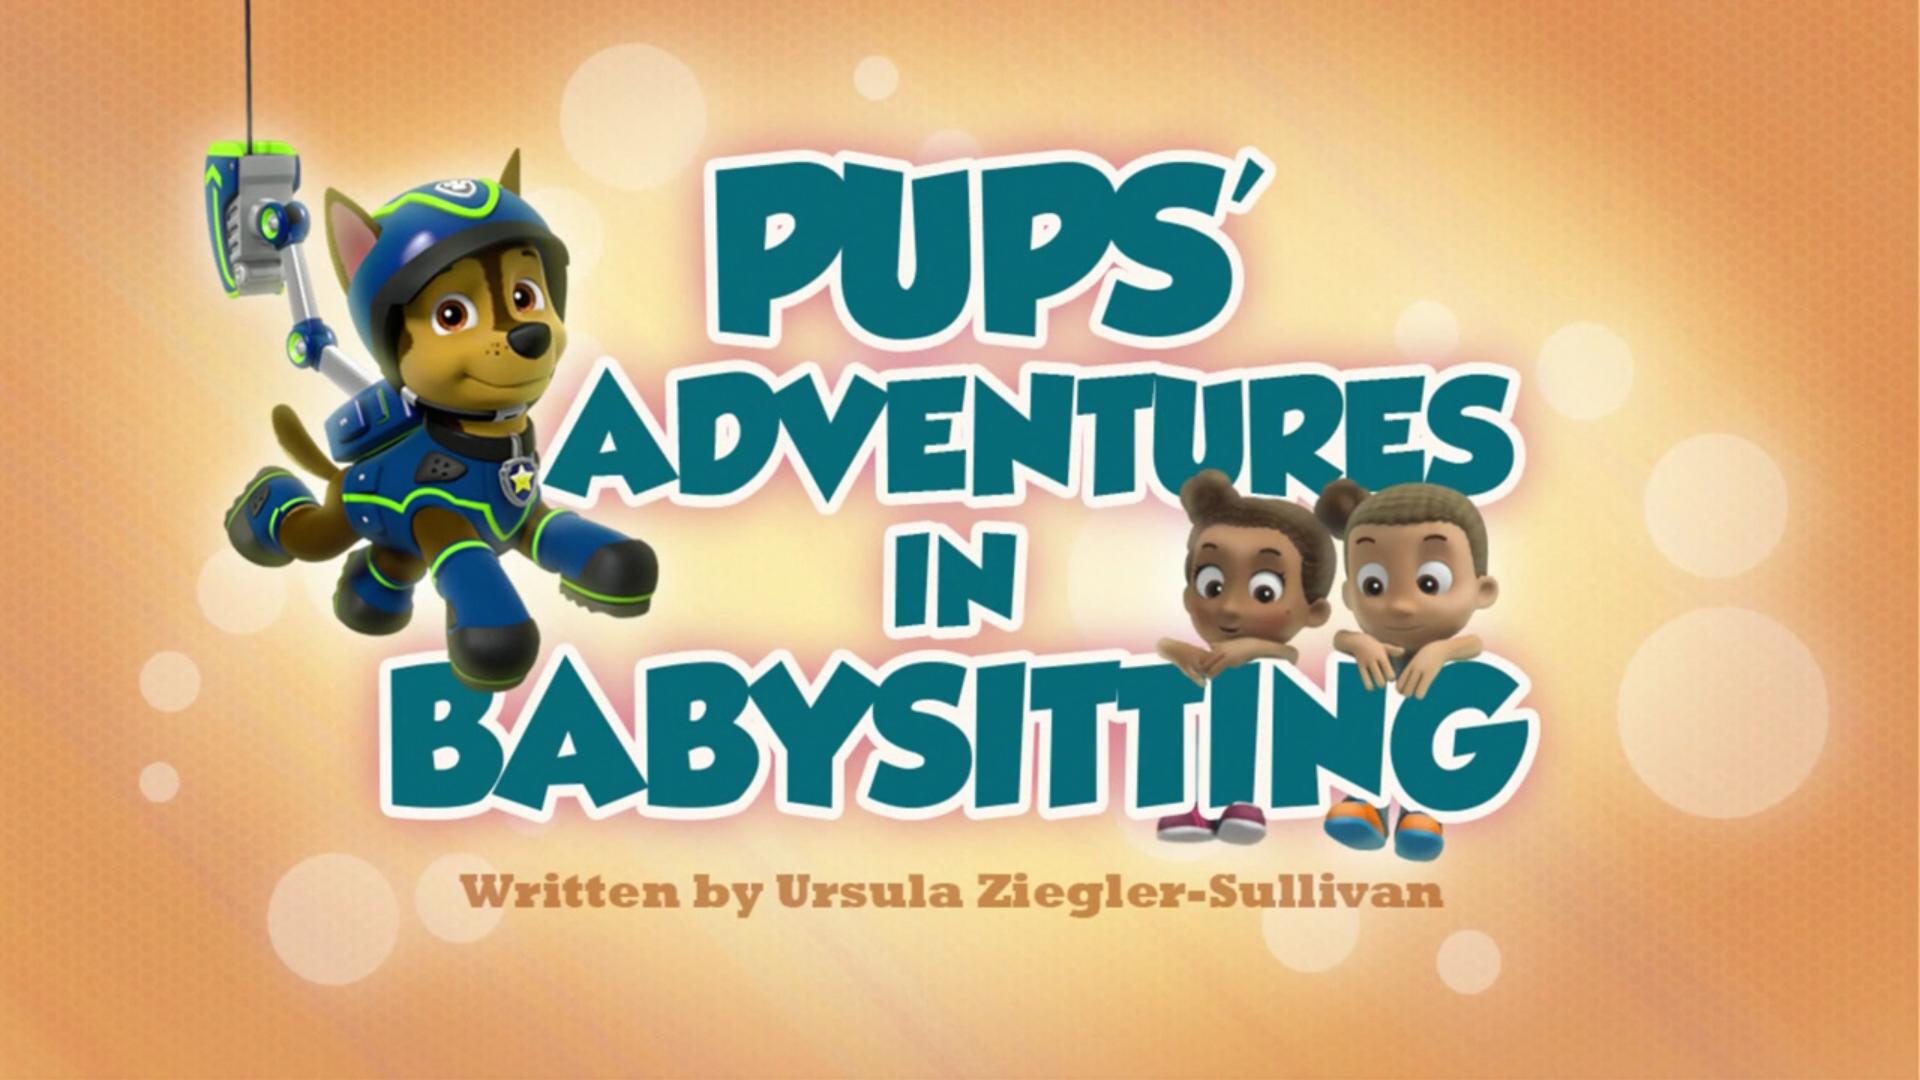 advertising babysitting